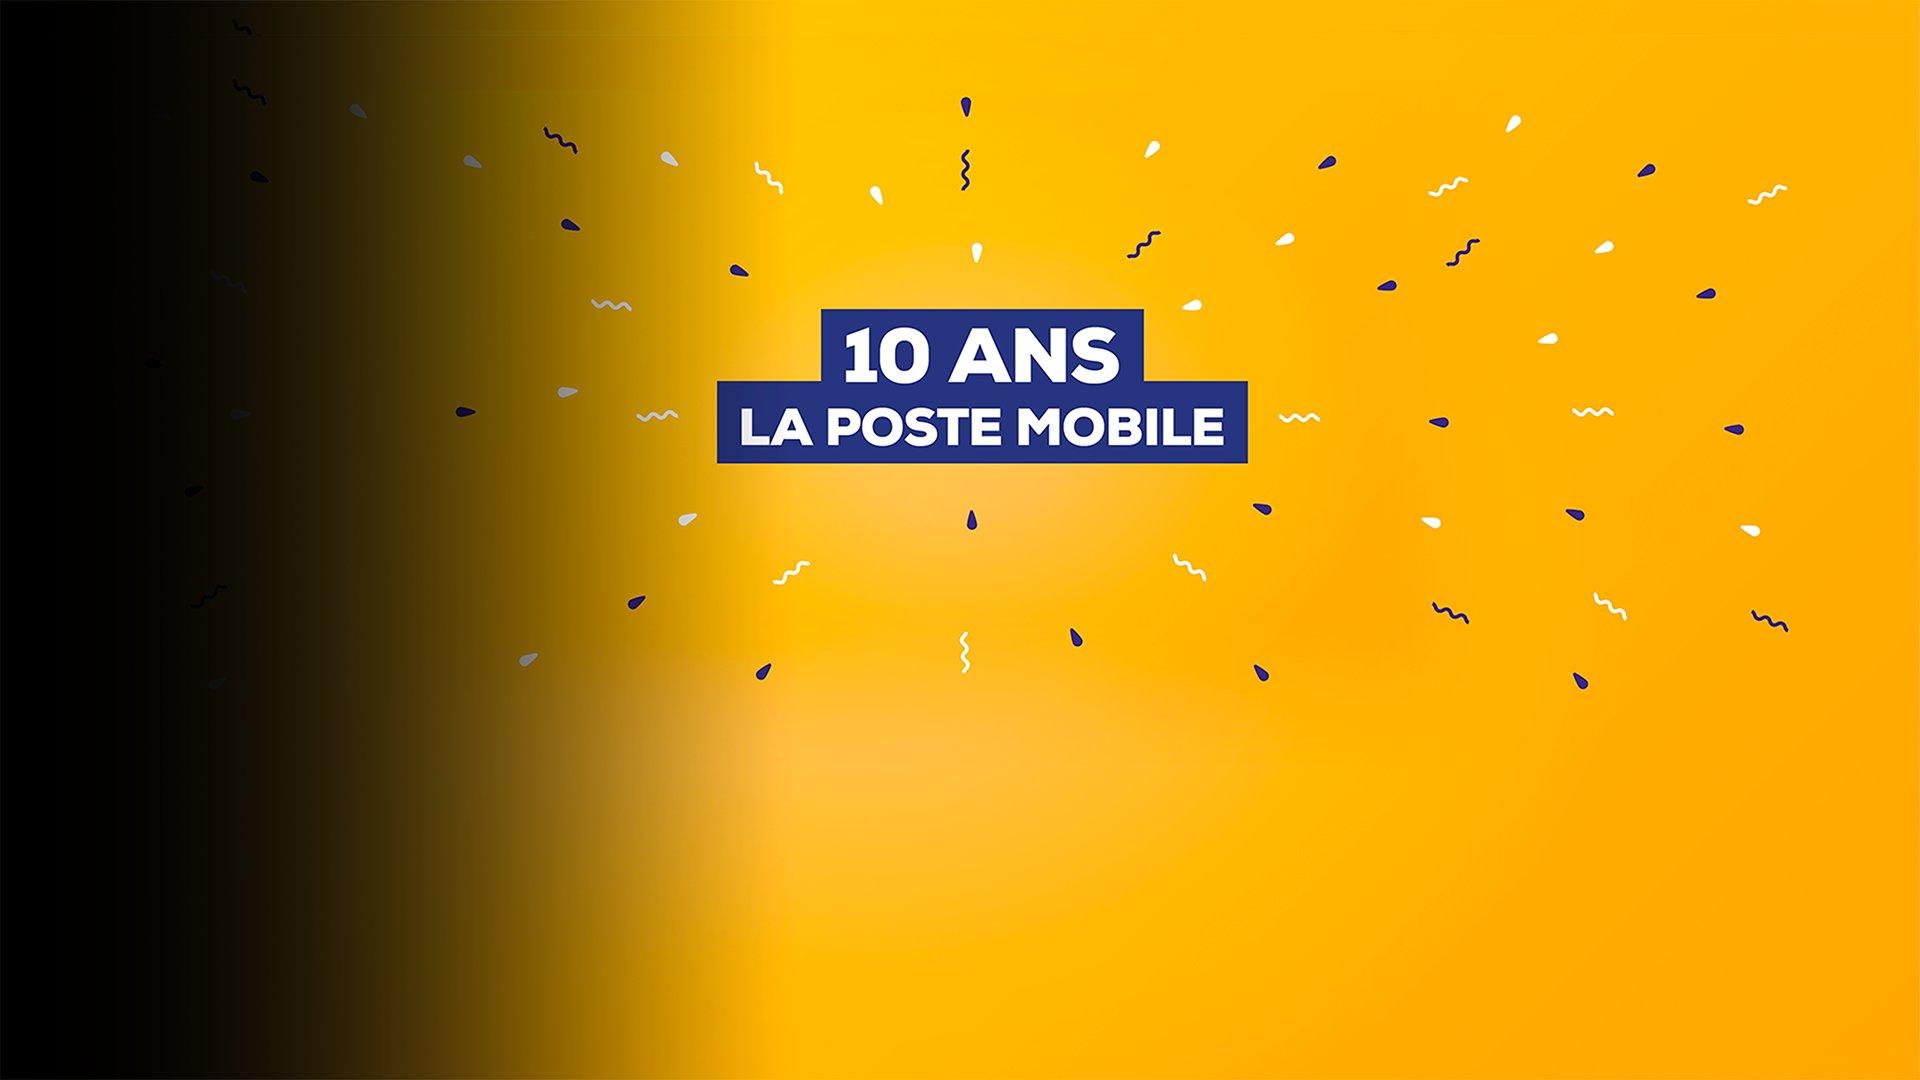 fond 10 ans La Poste Mobile